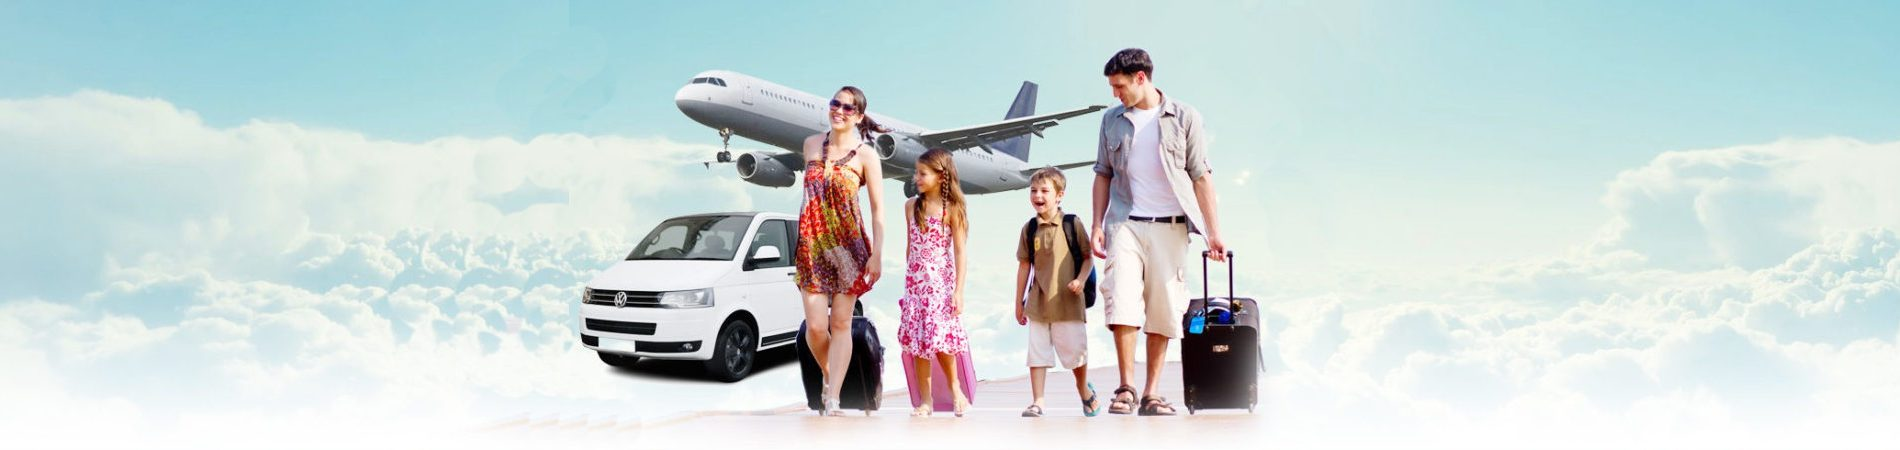 majorca airport transfer alcudia